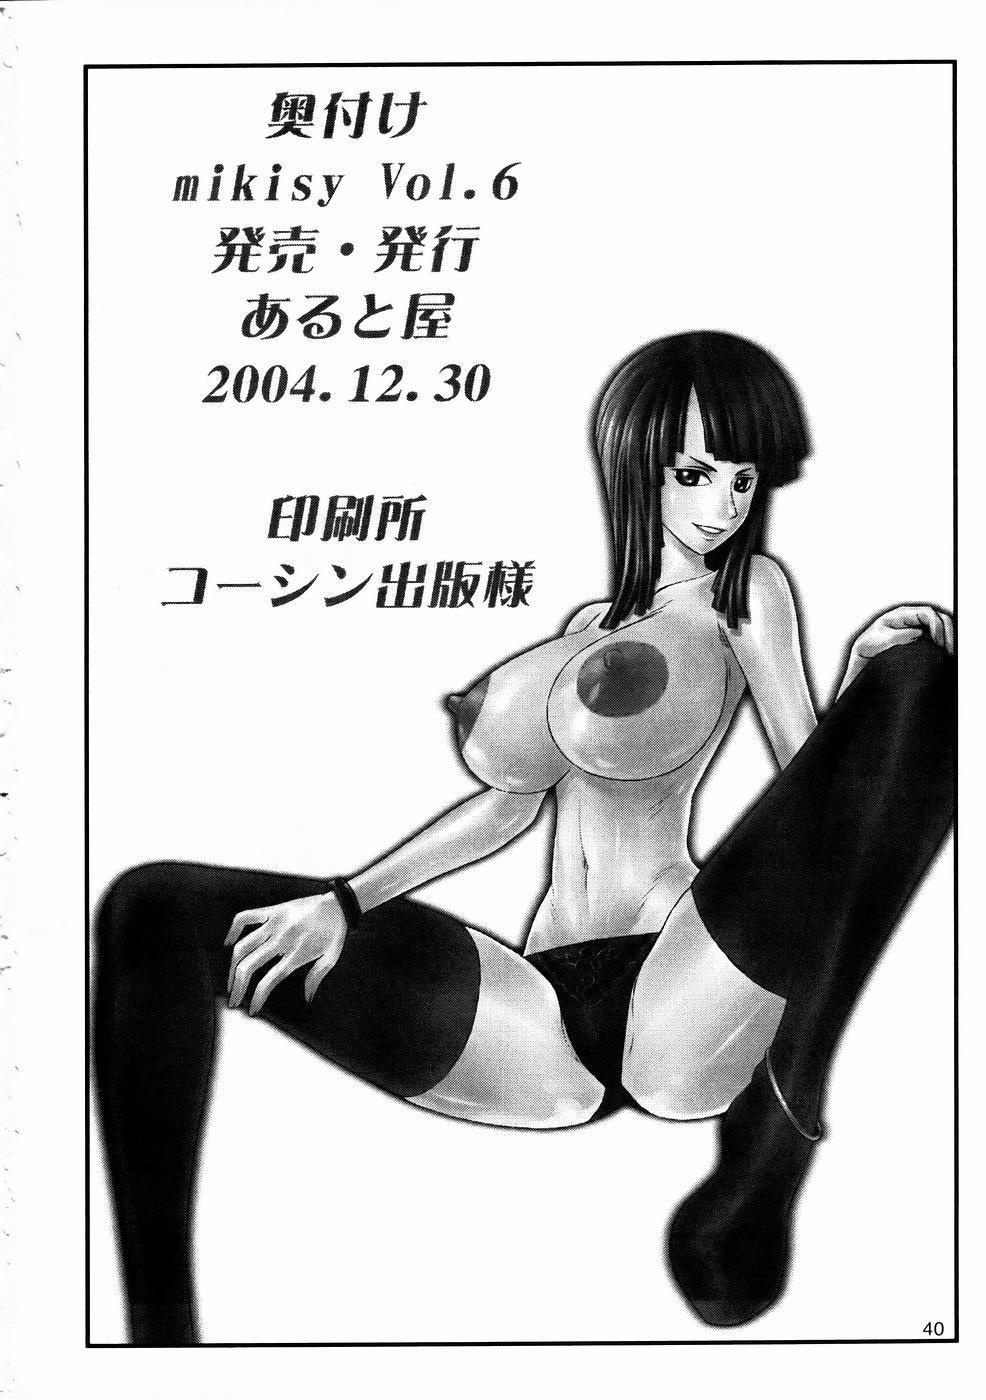 Mikisy Vol. 6 40